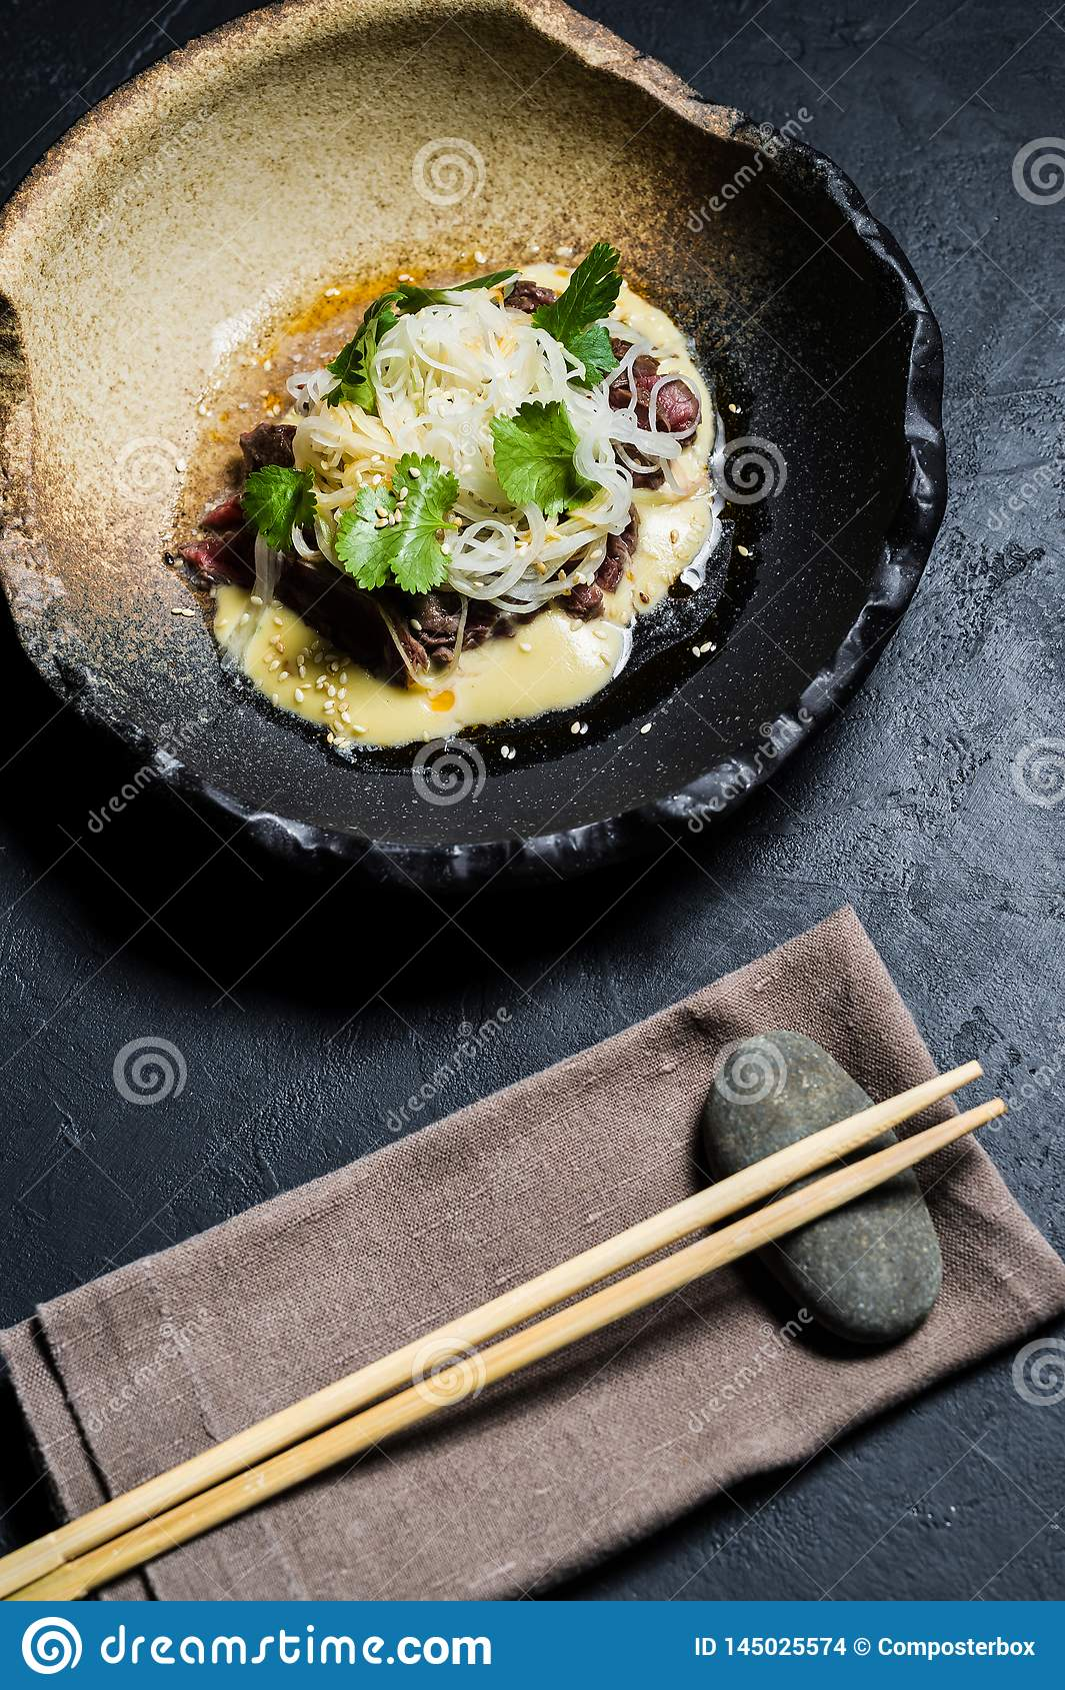 Beef tenderloin with sauce and glass noodles, dark background.